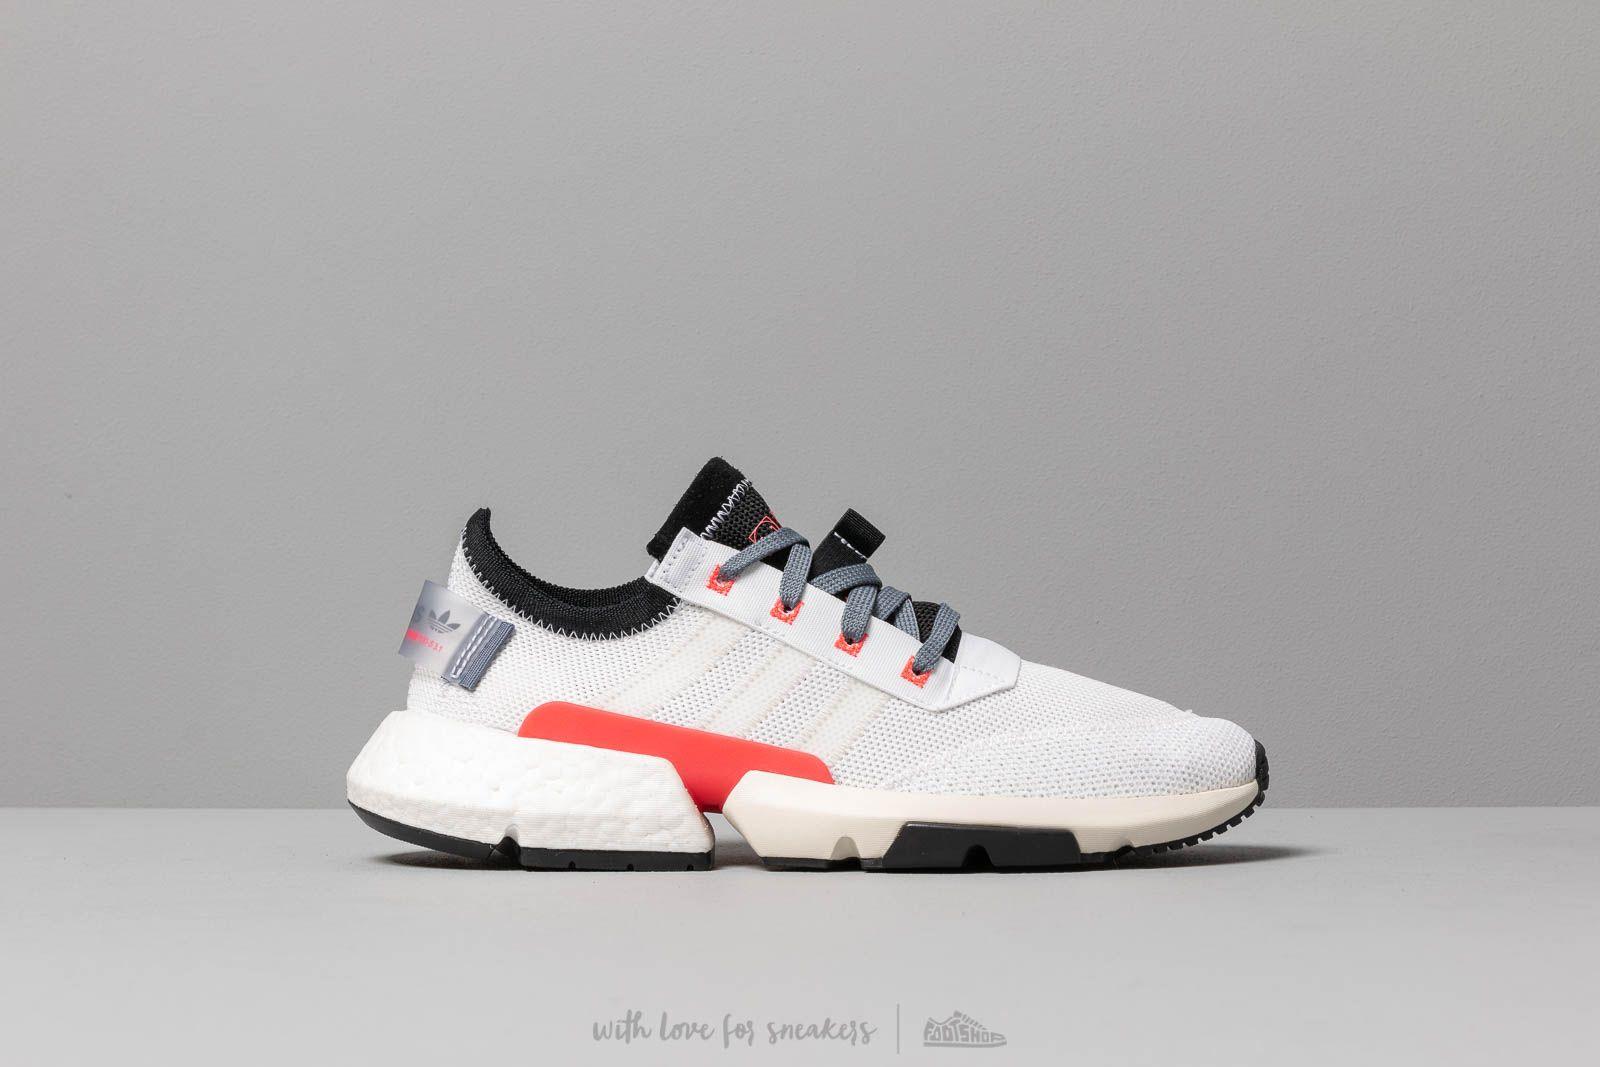 a04086b0a6a5 adidas POD-S3.1 Ftw White  Ftw White  Core Black at a